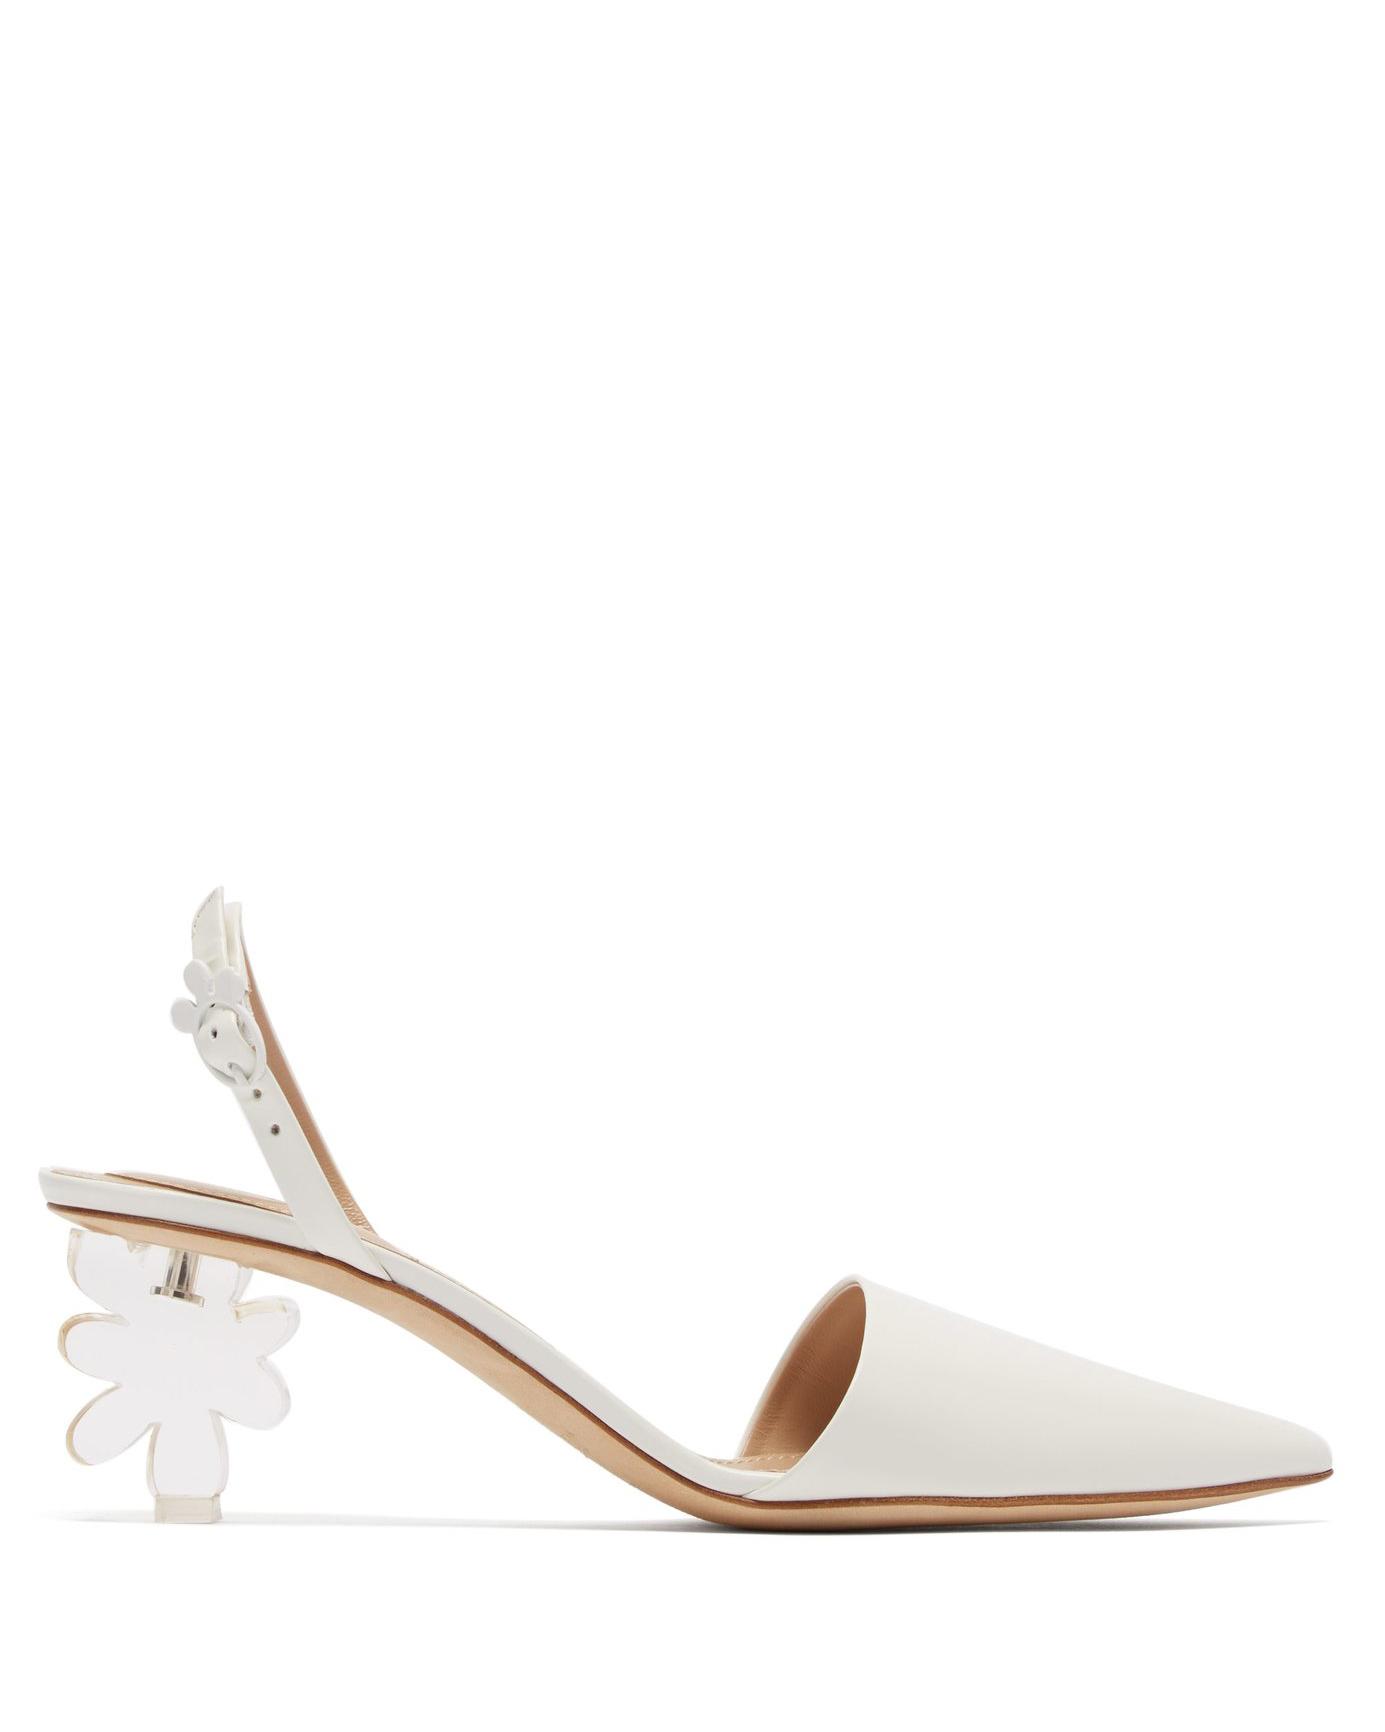 Simone Rocha Plexiglas Flower-Heel Leather Sling-Back Pumps